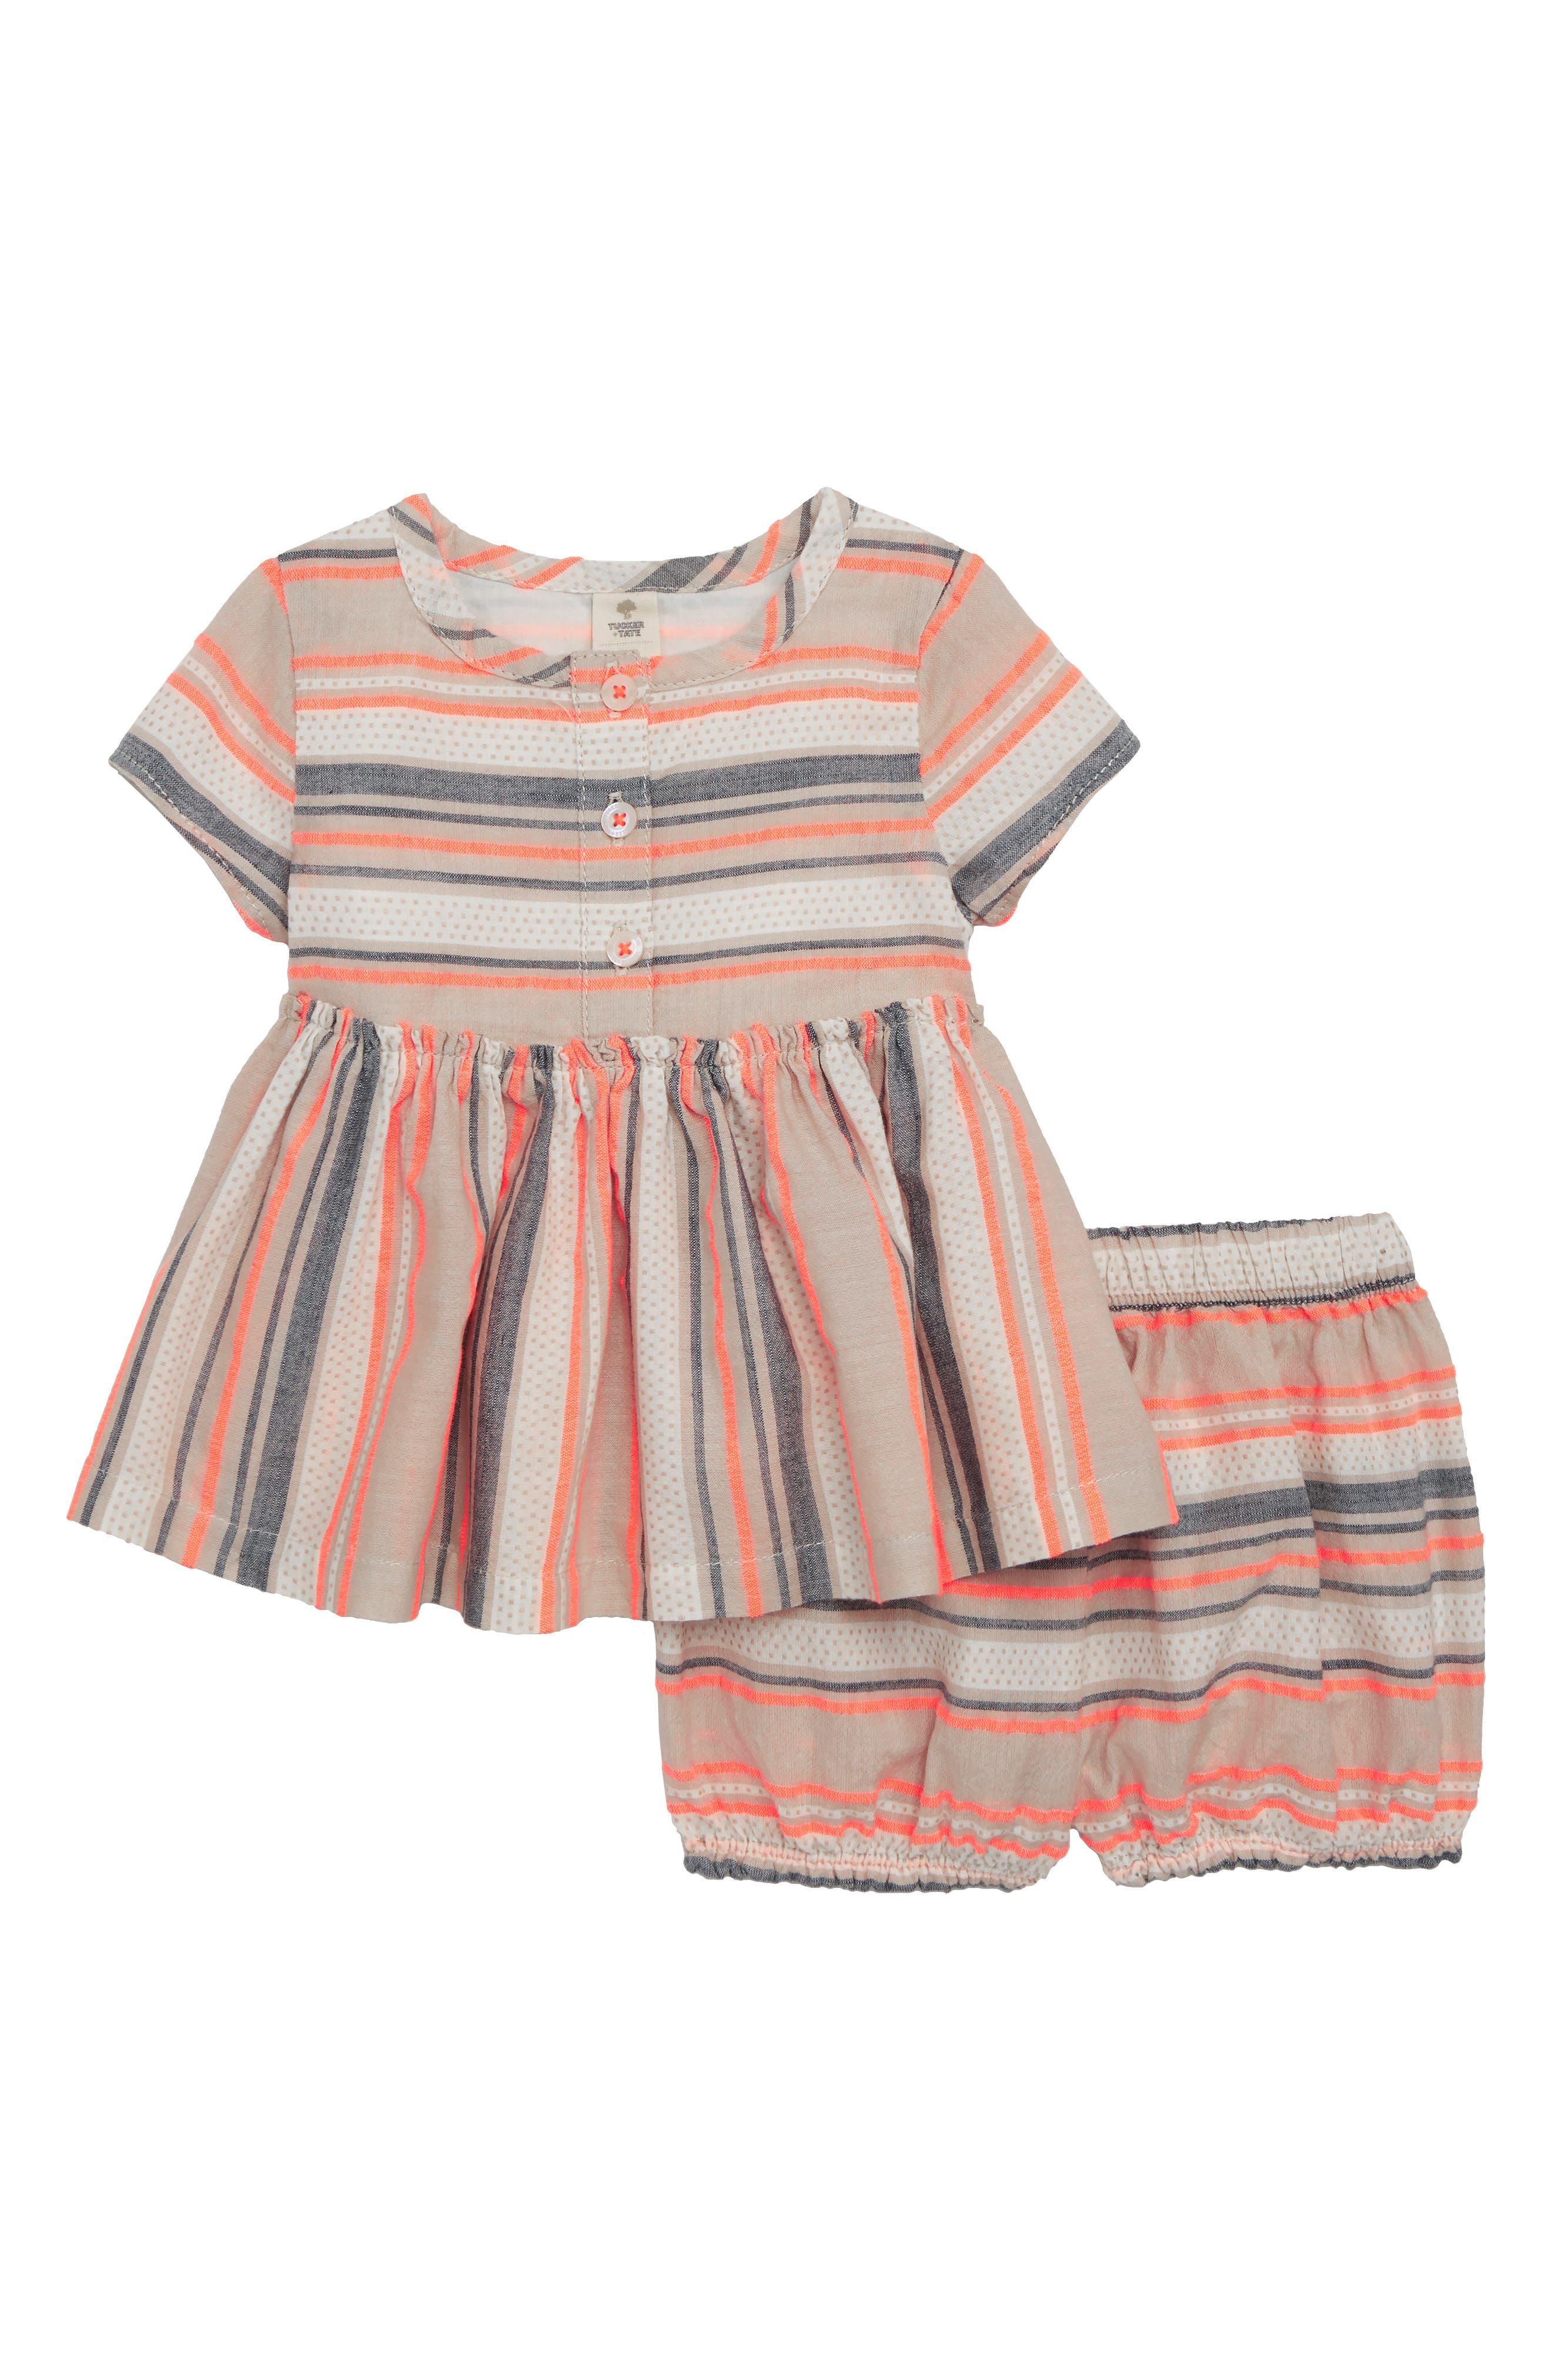 Woven Stripe Swing Top & Bubble Shorts Set,                             Main thumbnail 1, color,                             680